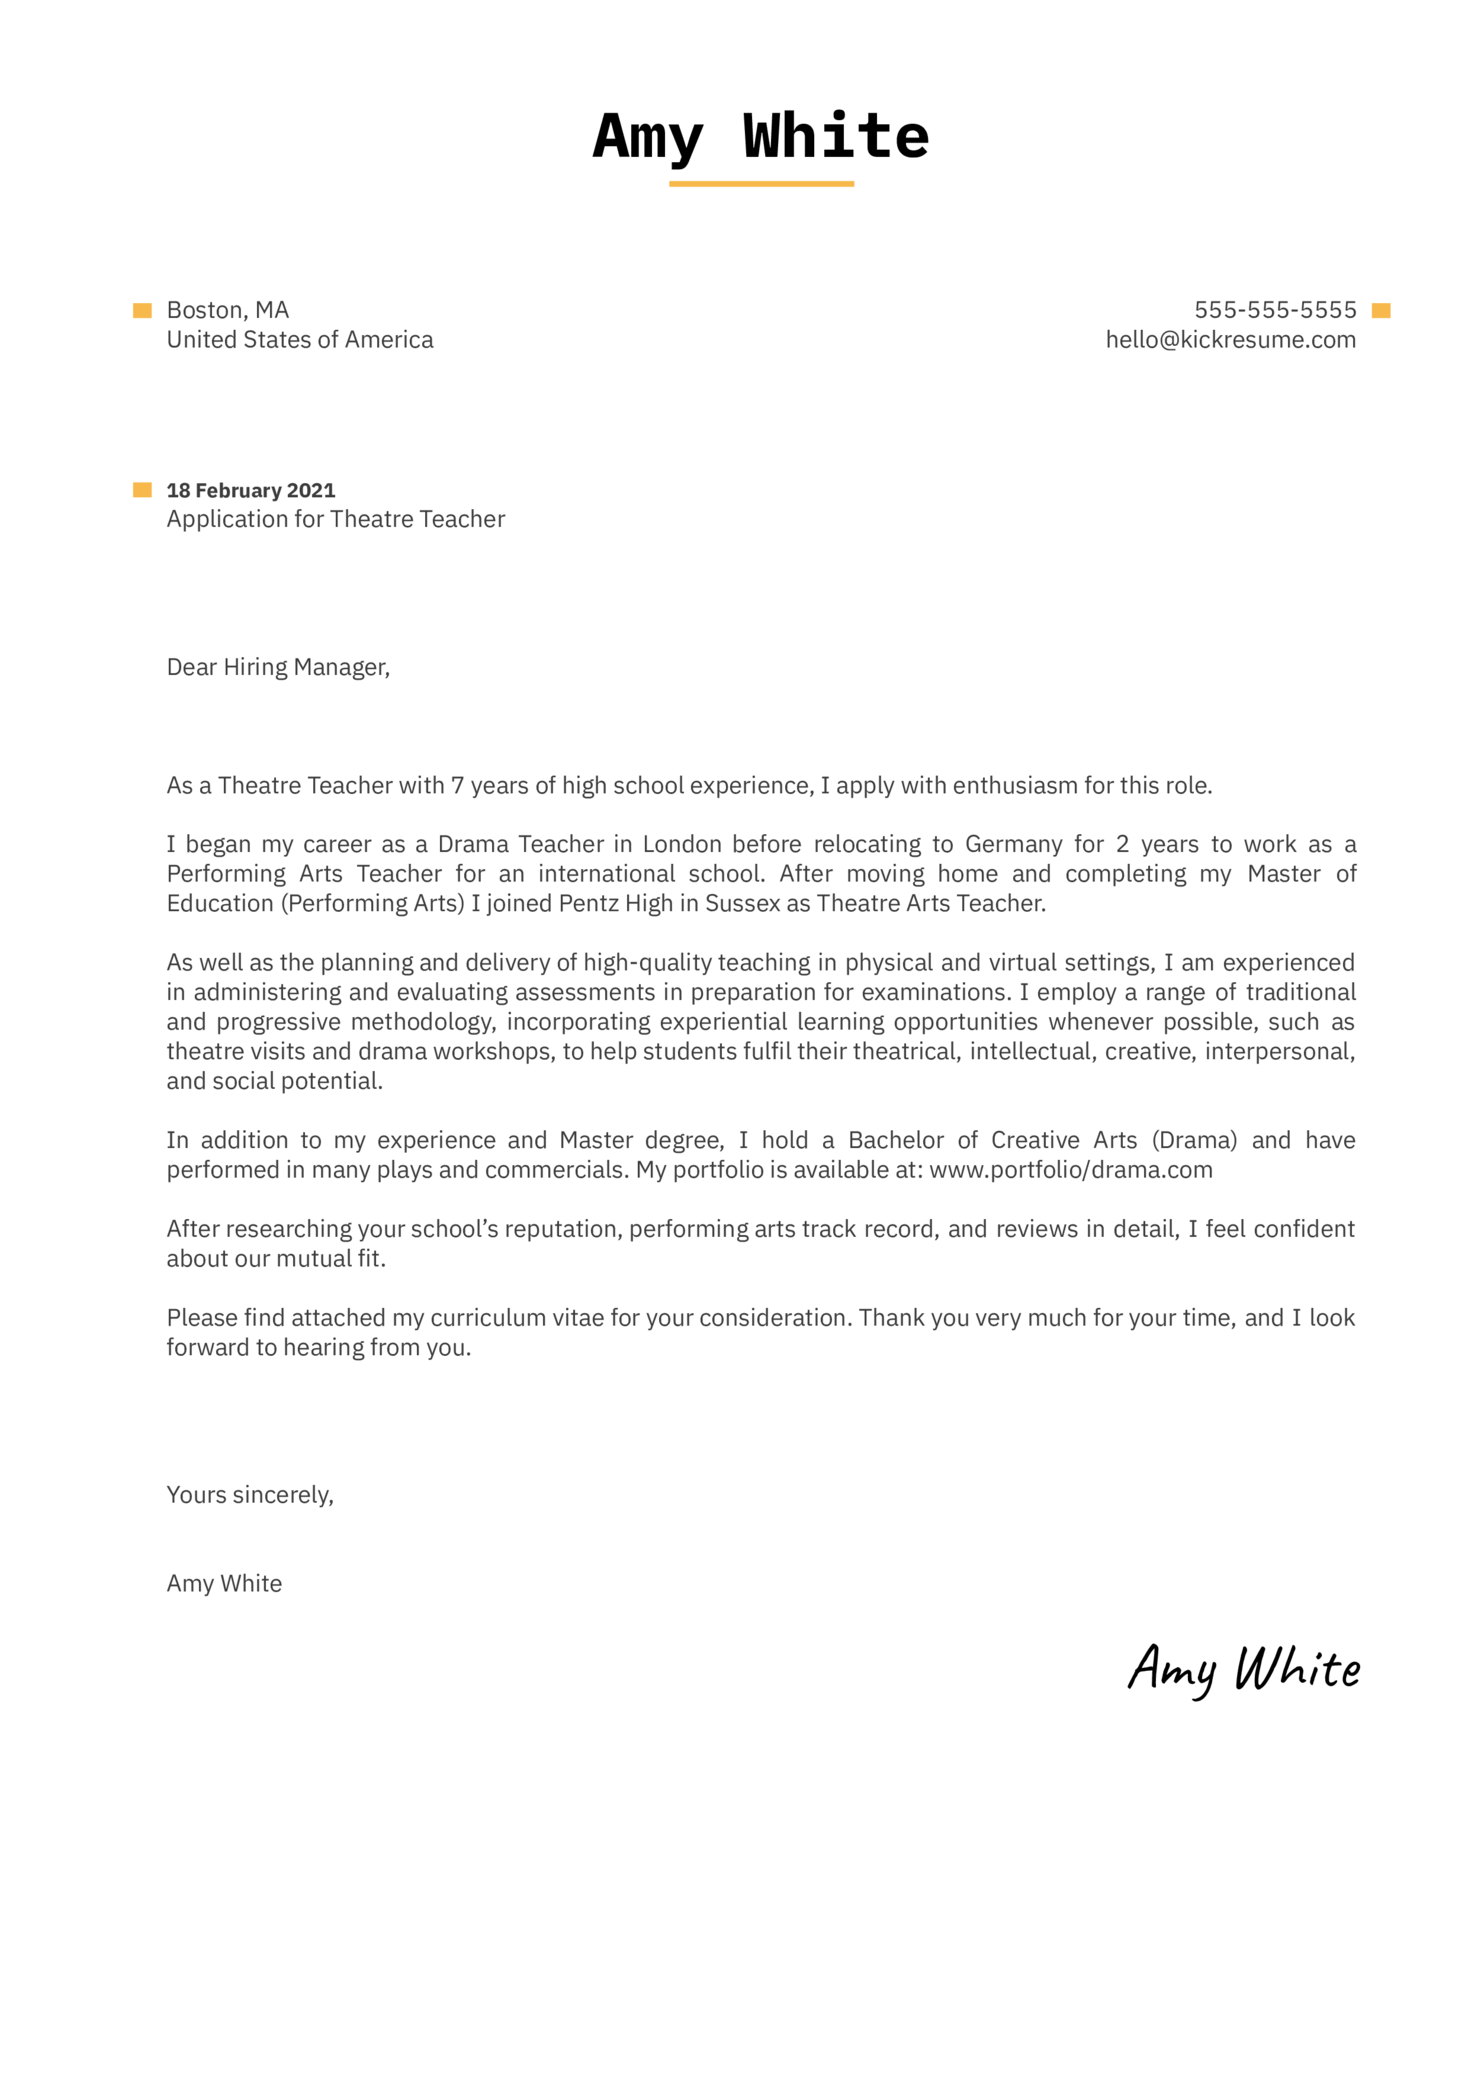 Theatre Teacher Cover Letter Example